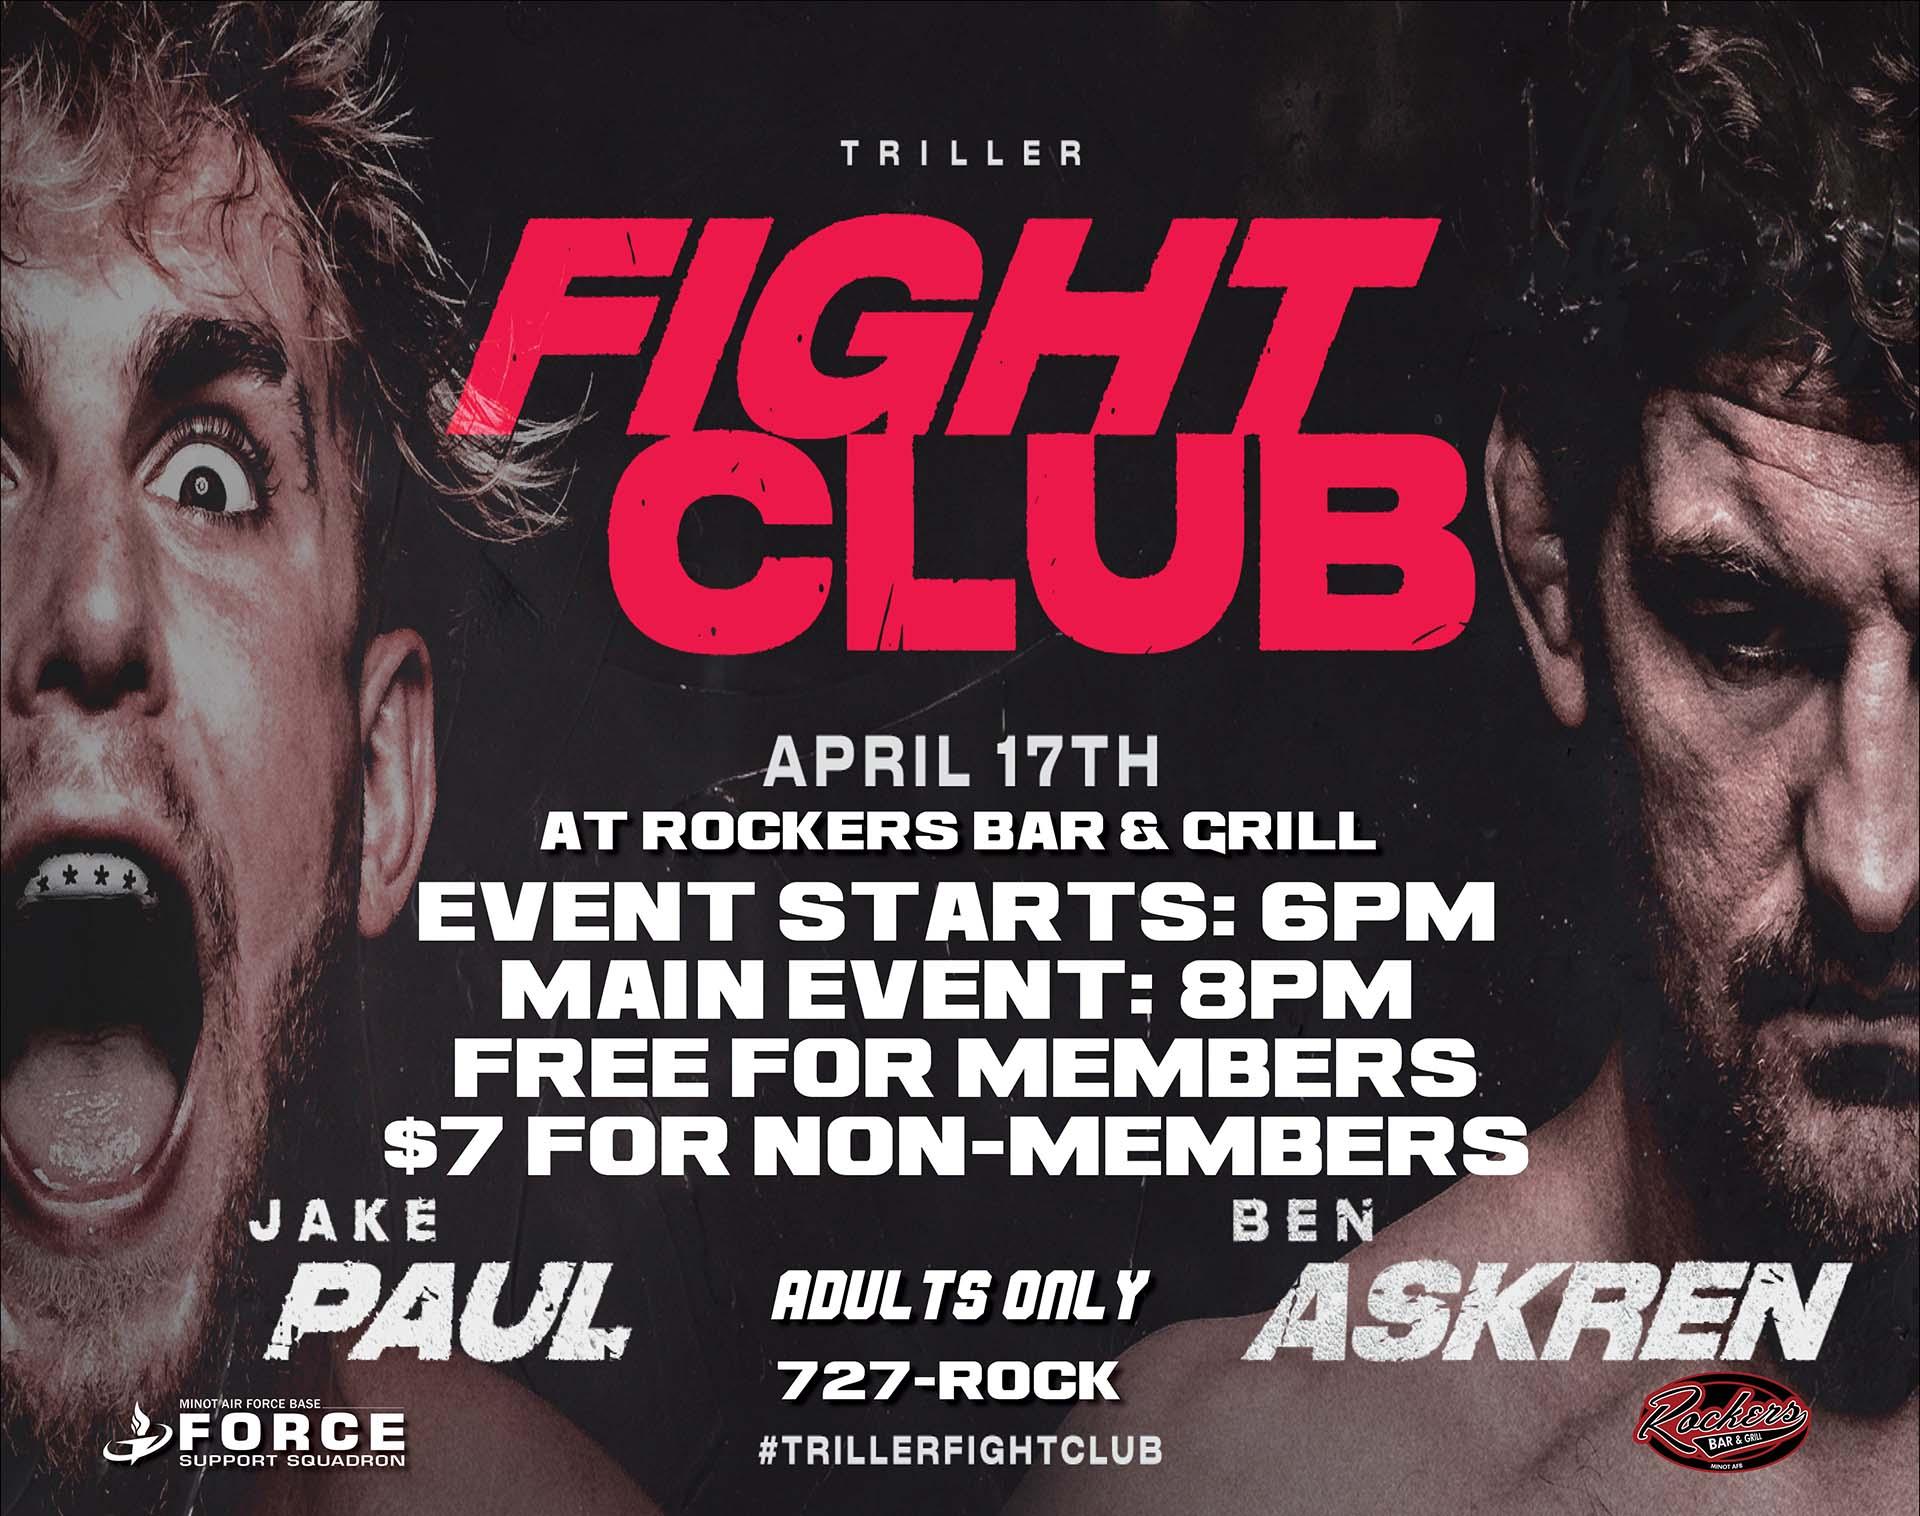 Fight Club: Jake Paul vs Ben Askren